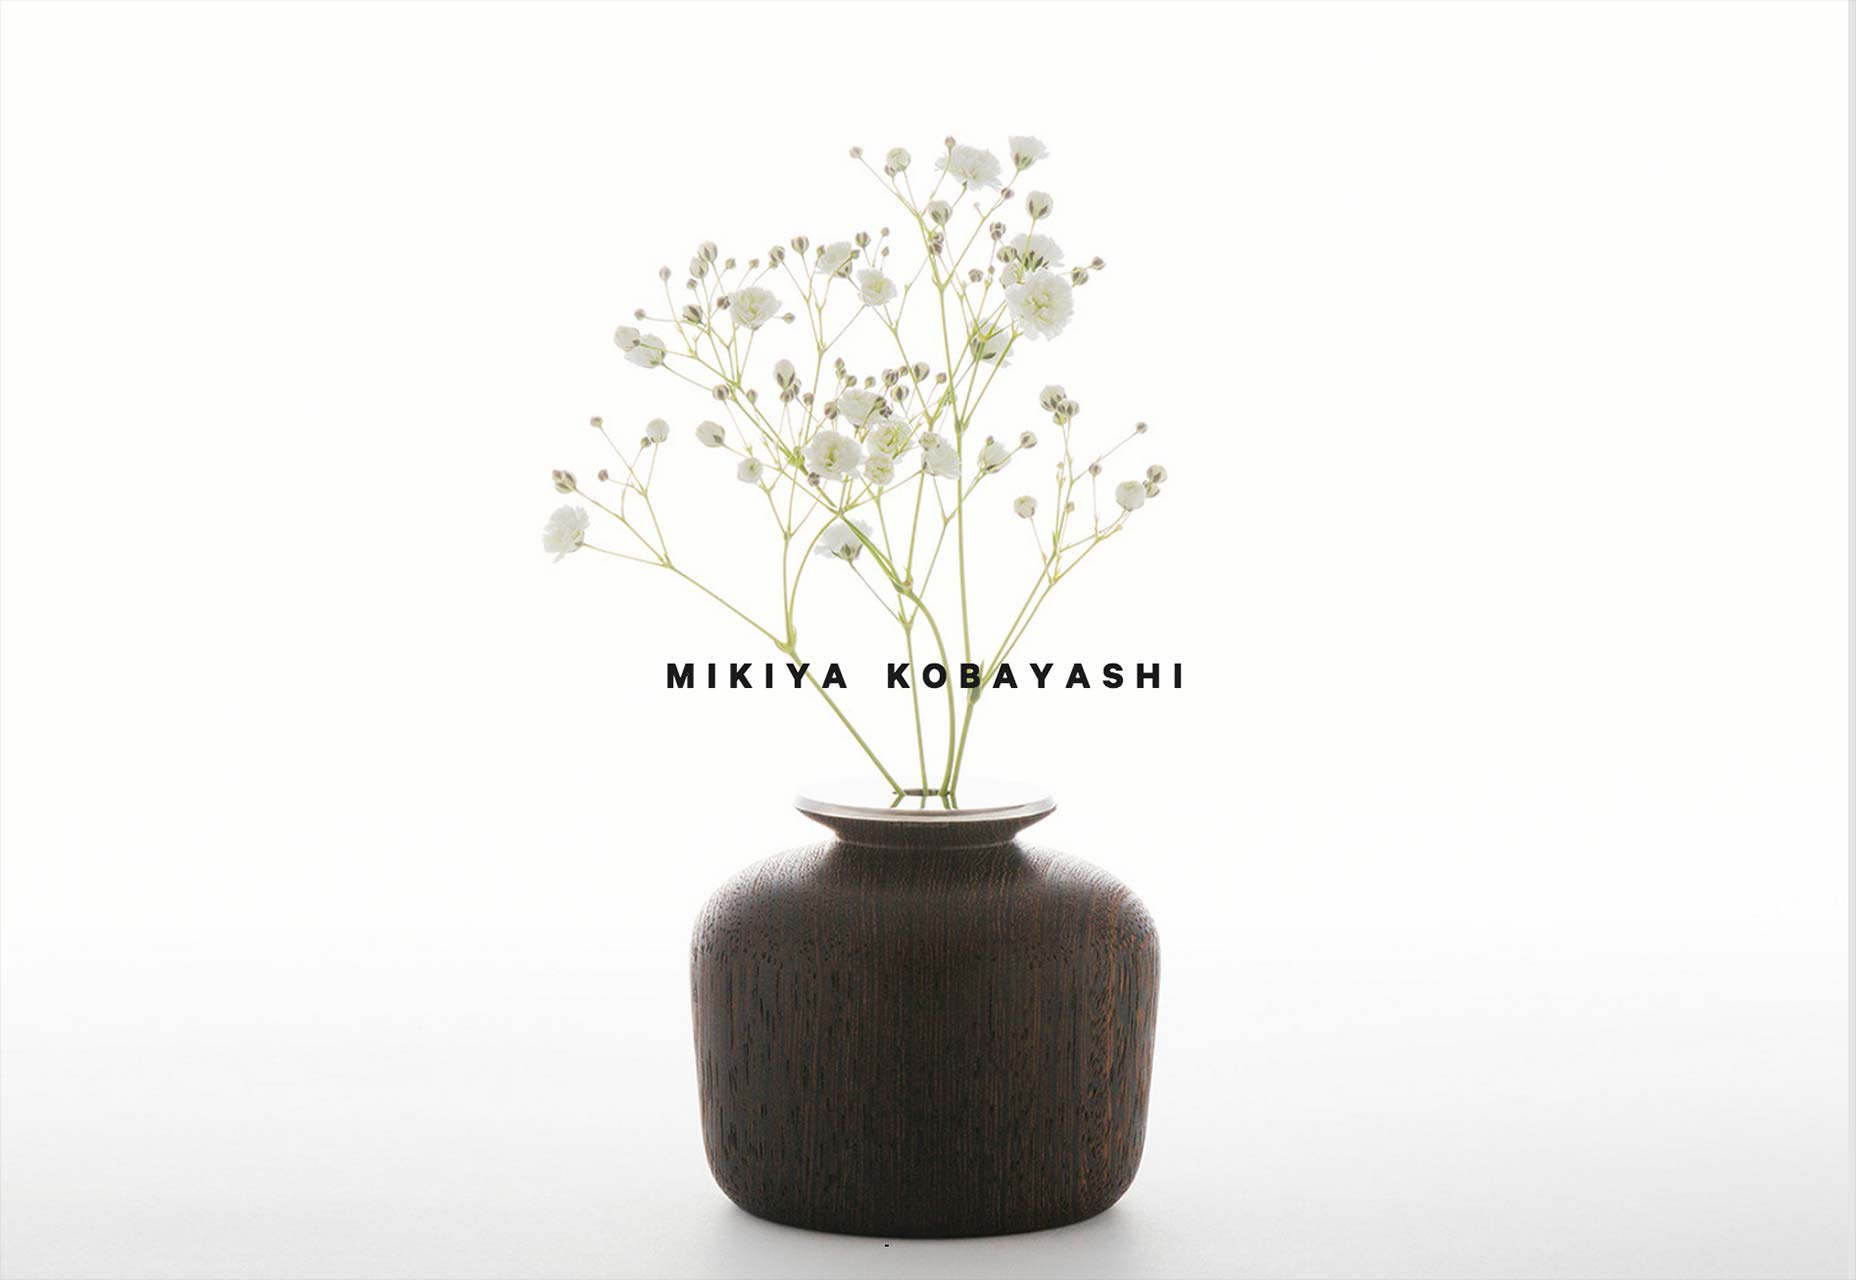 mikiyakobayashi